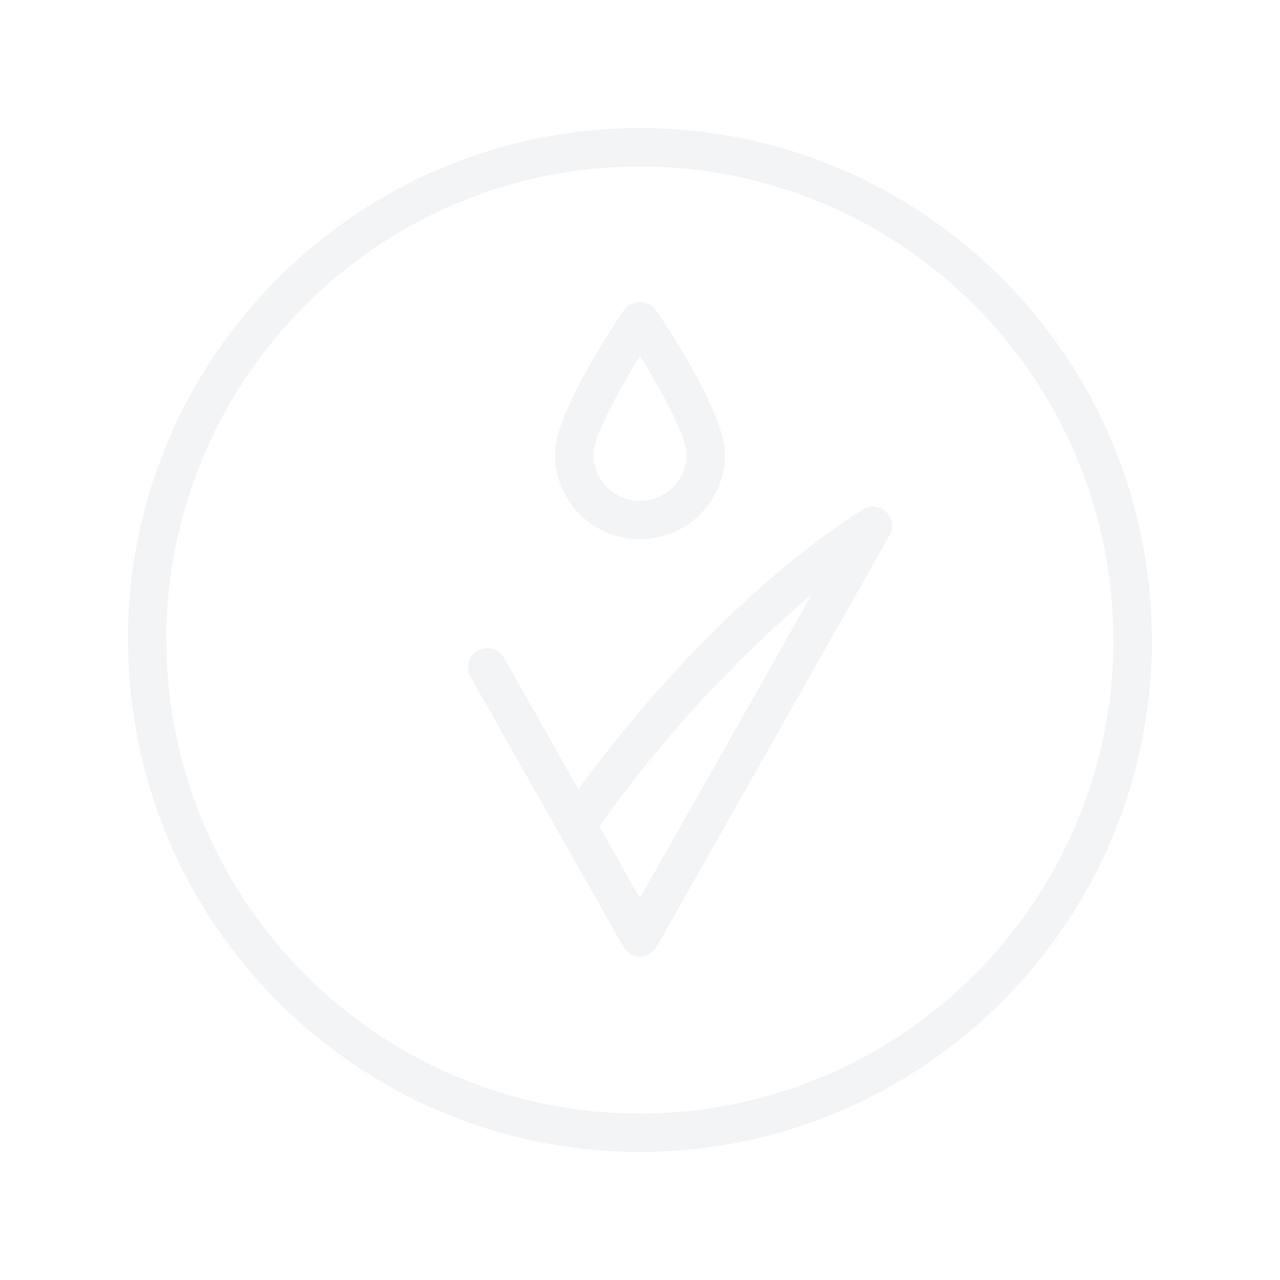 LOTTIE Arch Rival Shape & Highlight Eyebrow Pencil 2.59g